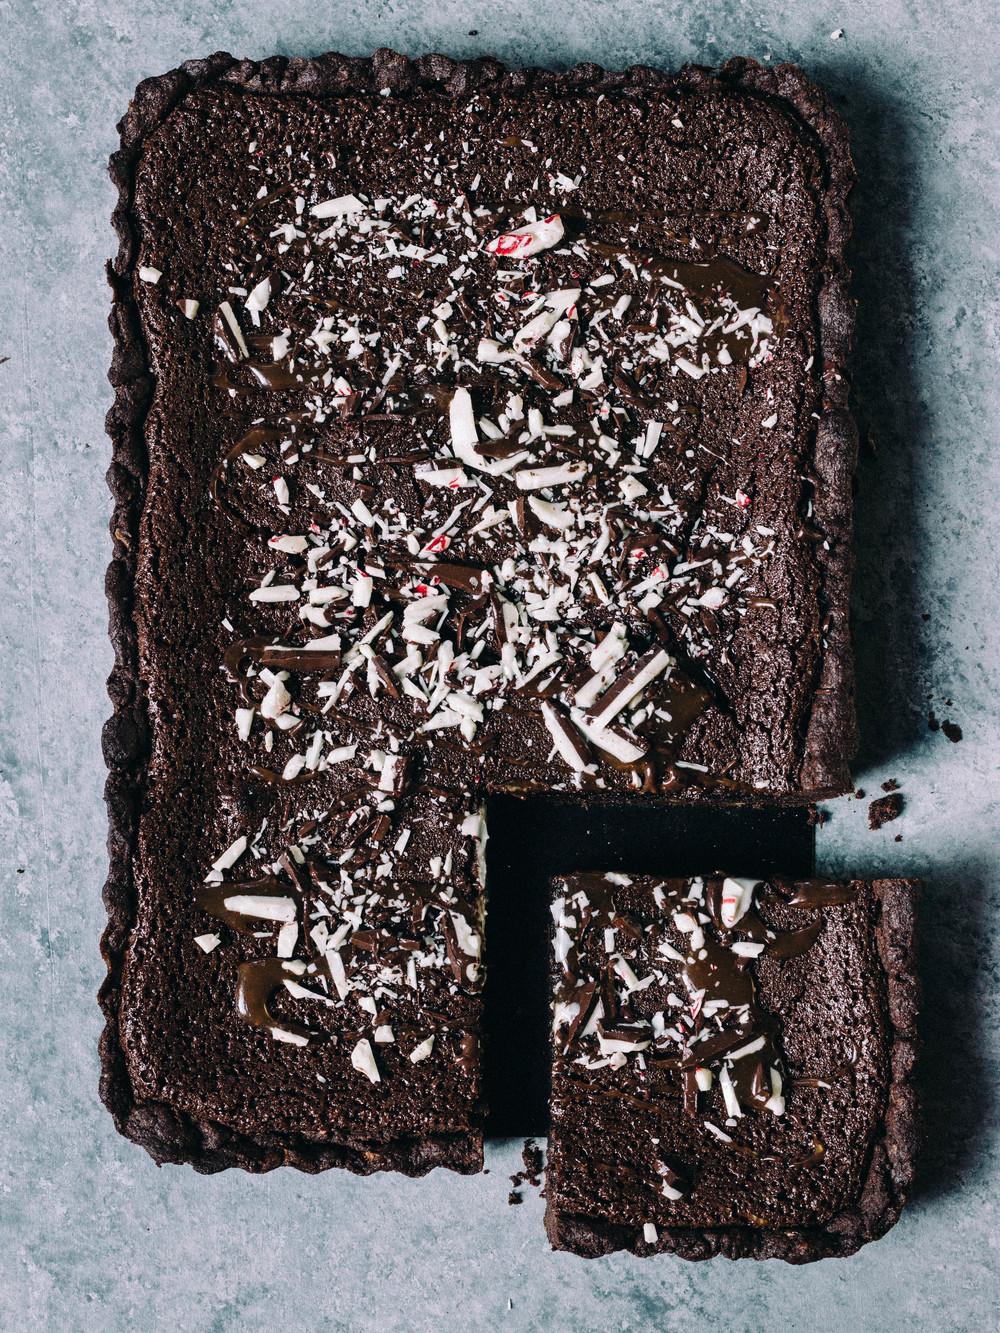 Chocolate Tart with Peppermint Bark Crust